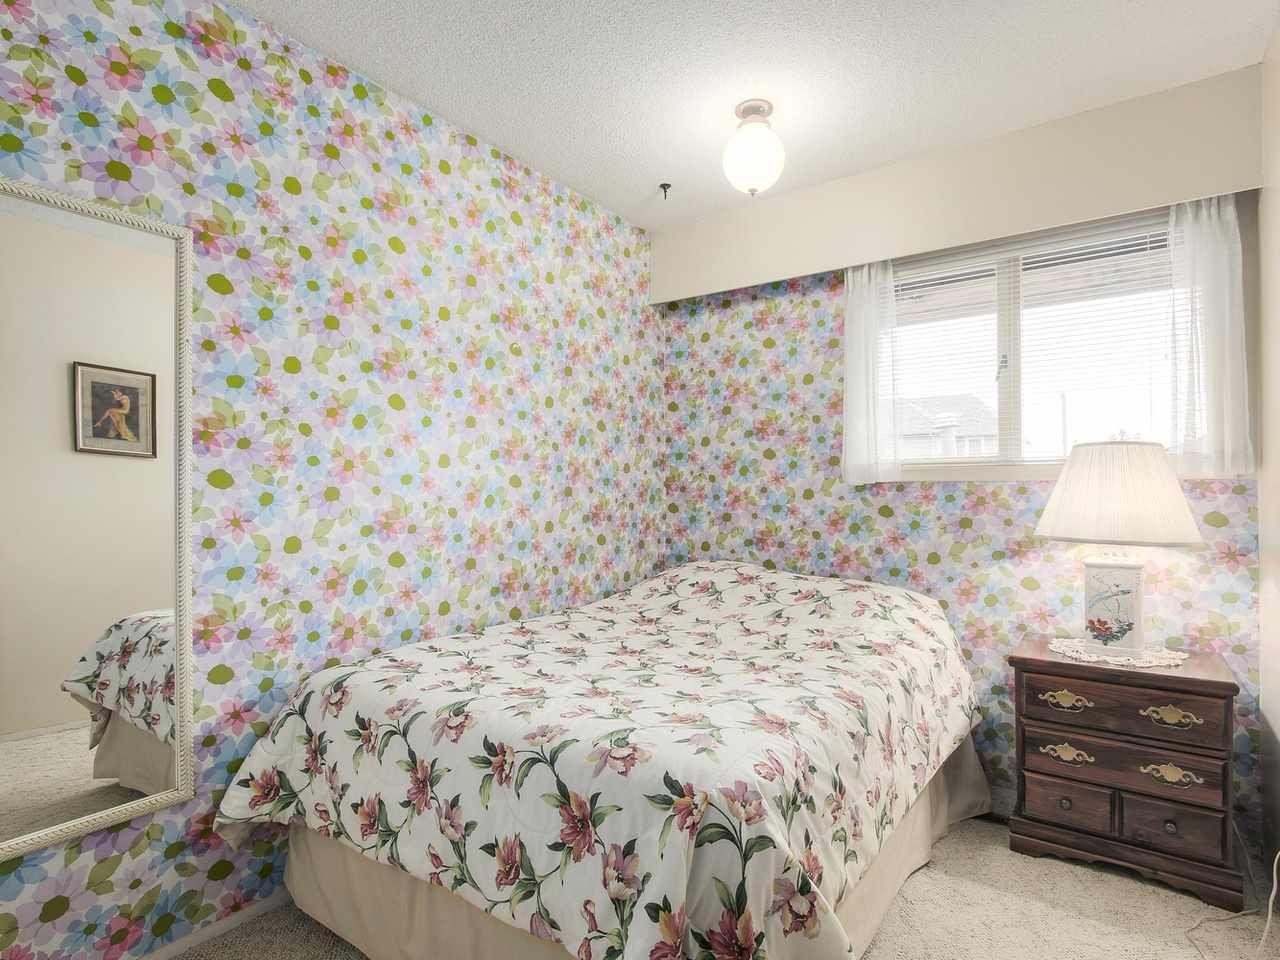 Photo 12: Photos: 1320 REGAN Avenue in Coquitlam: Central Coquitlam House for sale : MLS®# R2147096